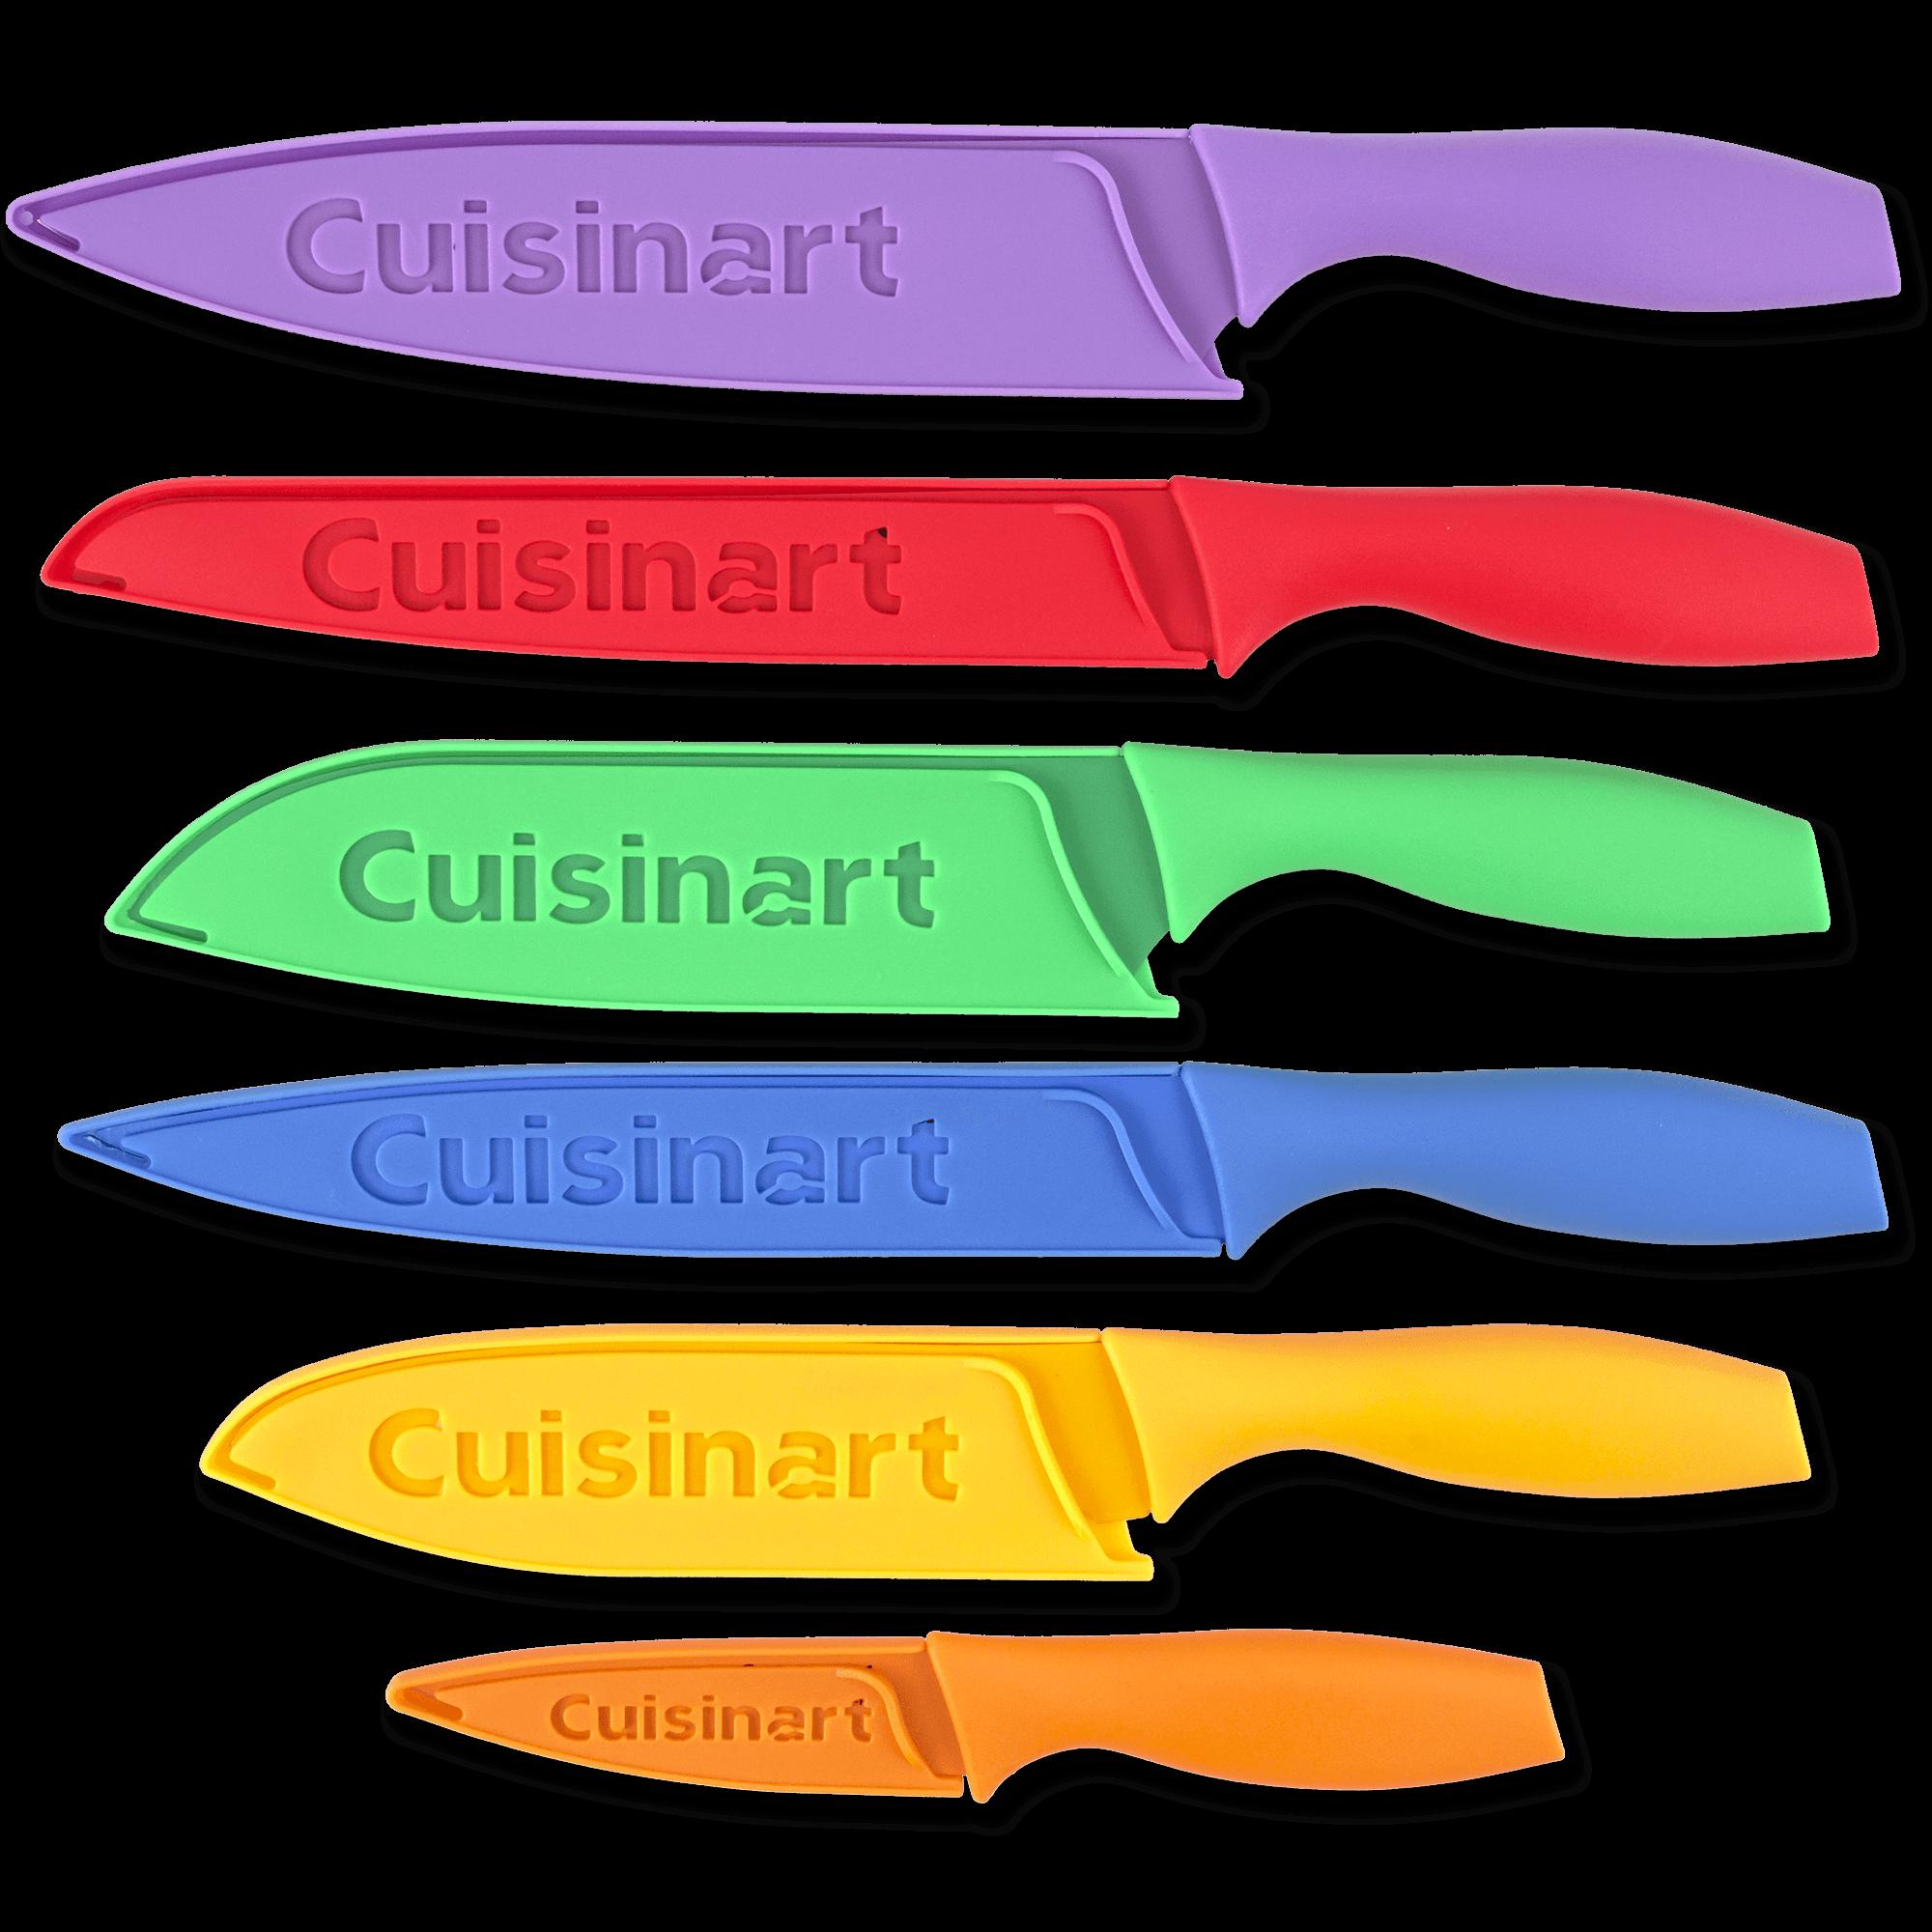 Cuisinart Advantage 12 Piece Knife Set